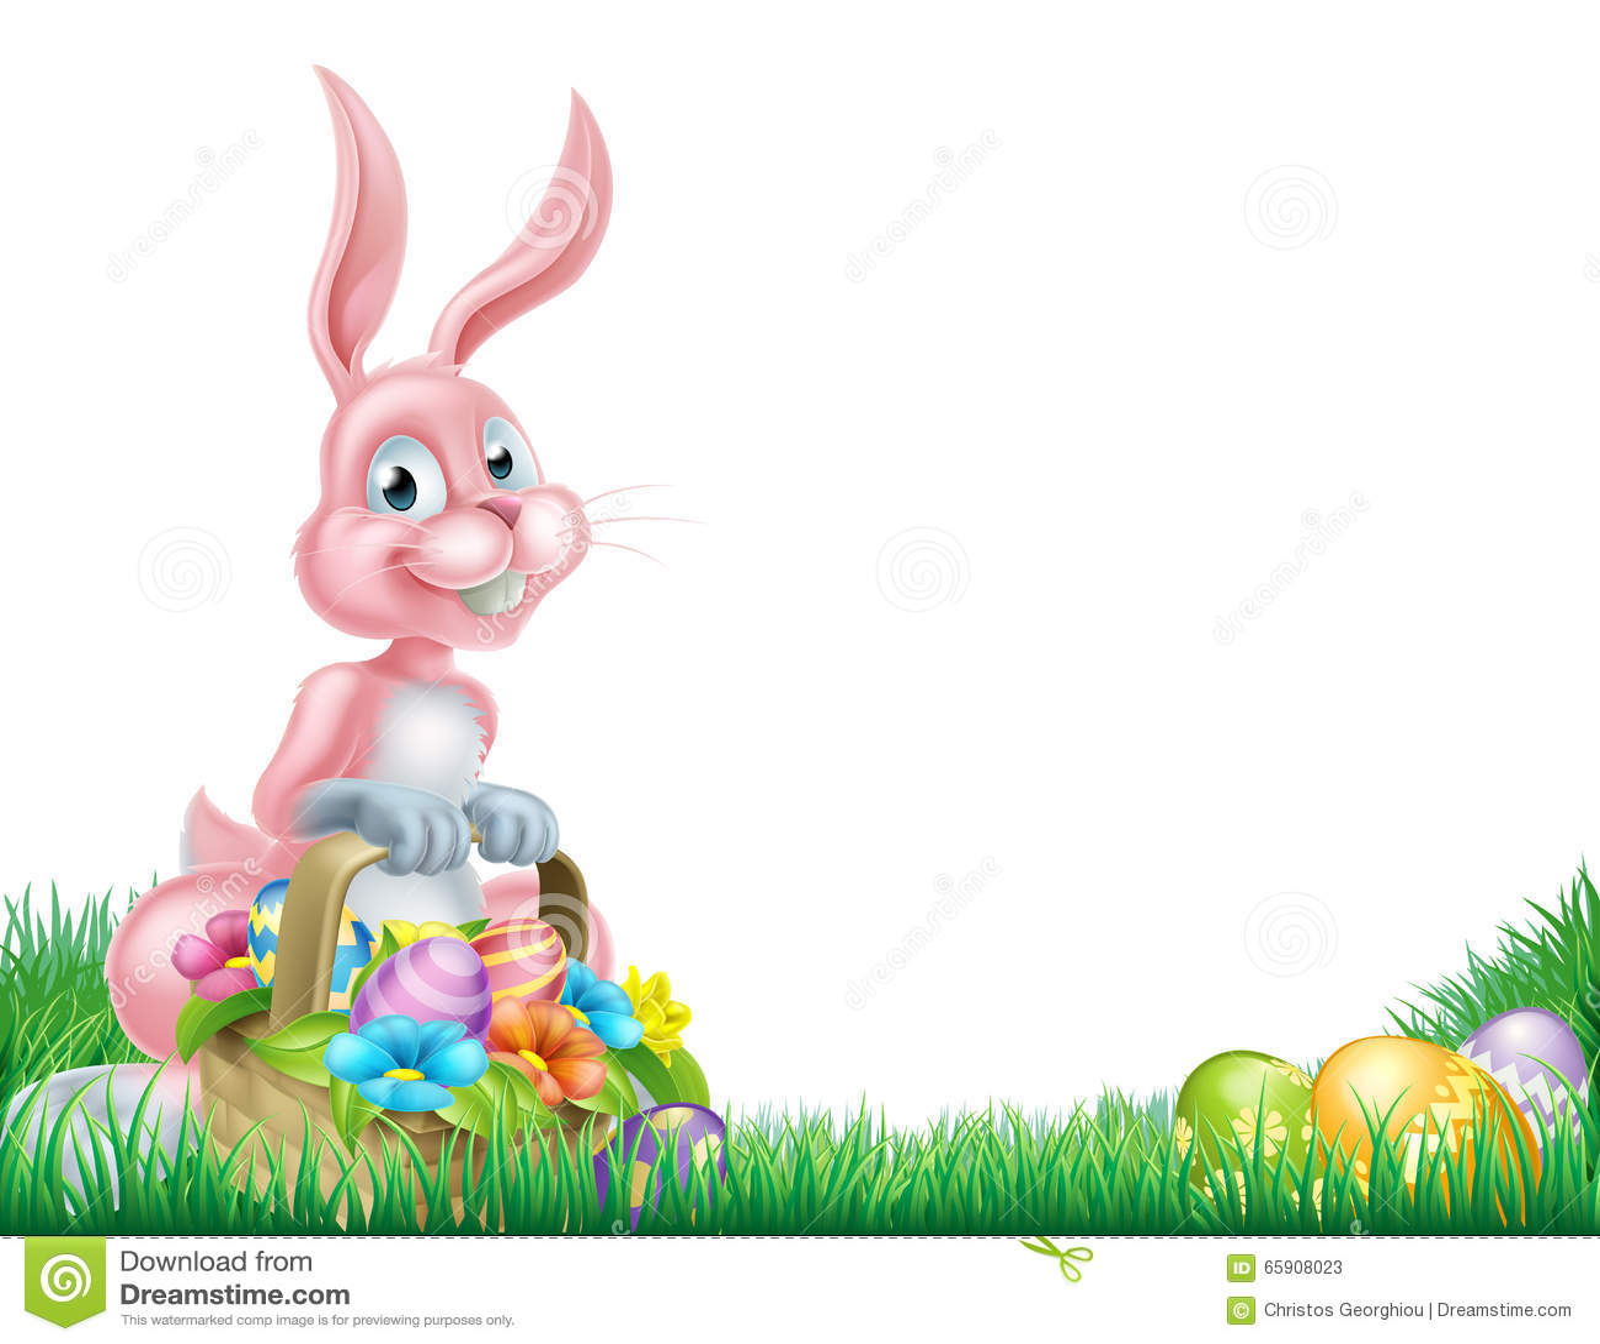 Cartoon Pink Easter Bunny Egg Hunt Stock Vector - Illustration of ... for Easter Egg Hunt Clipart  110ylc